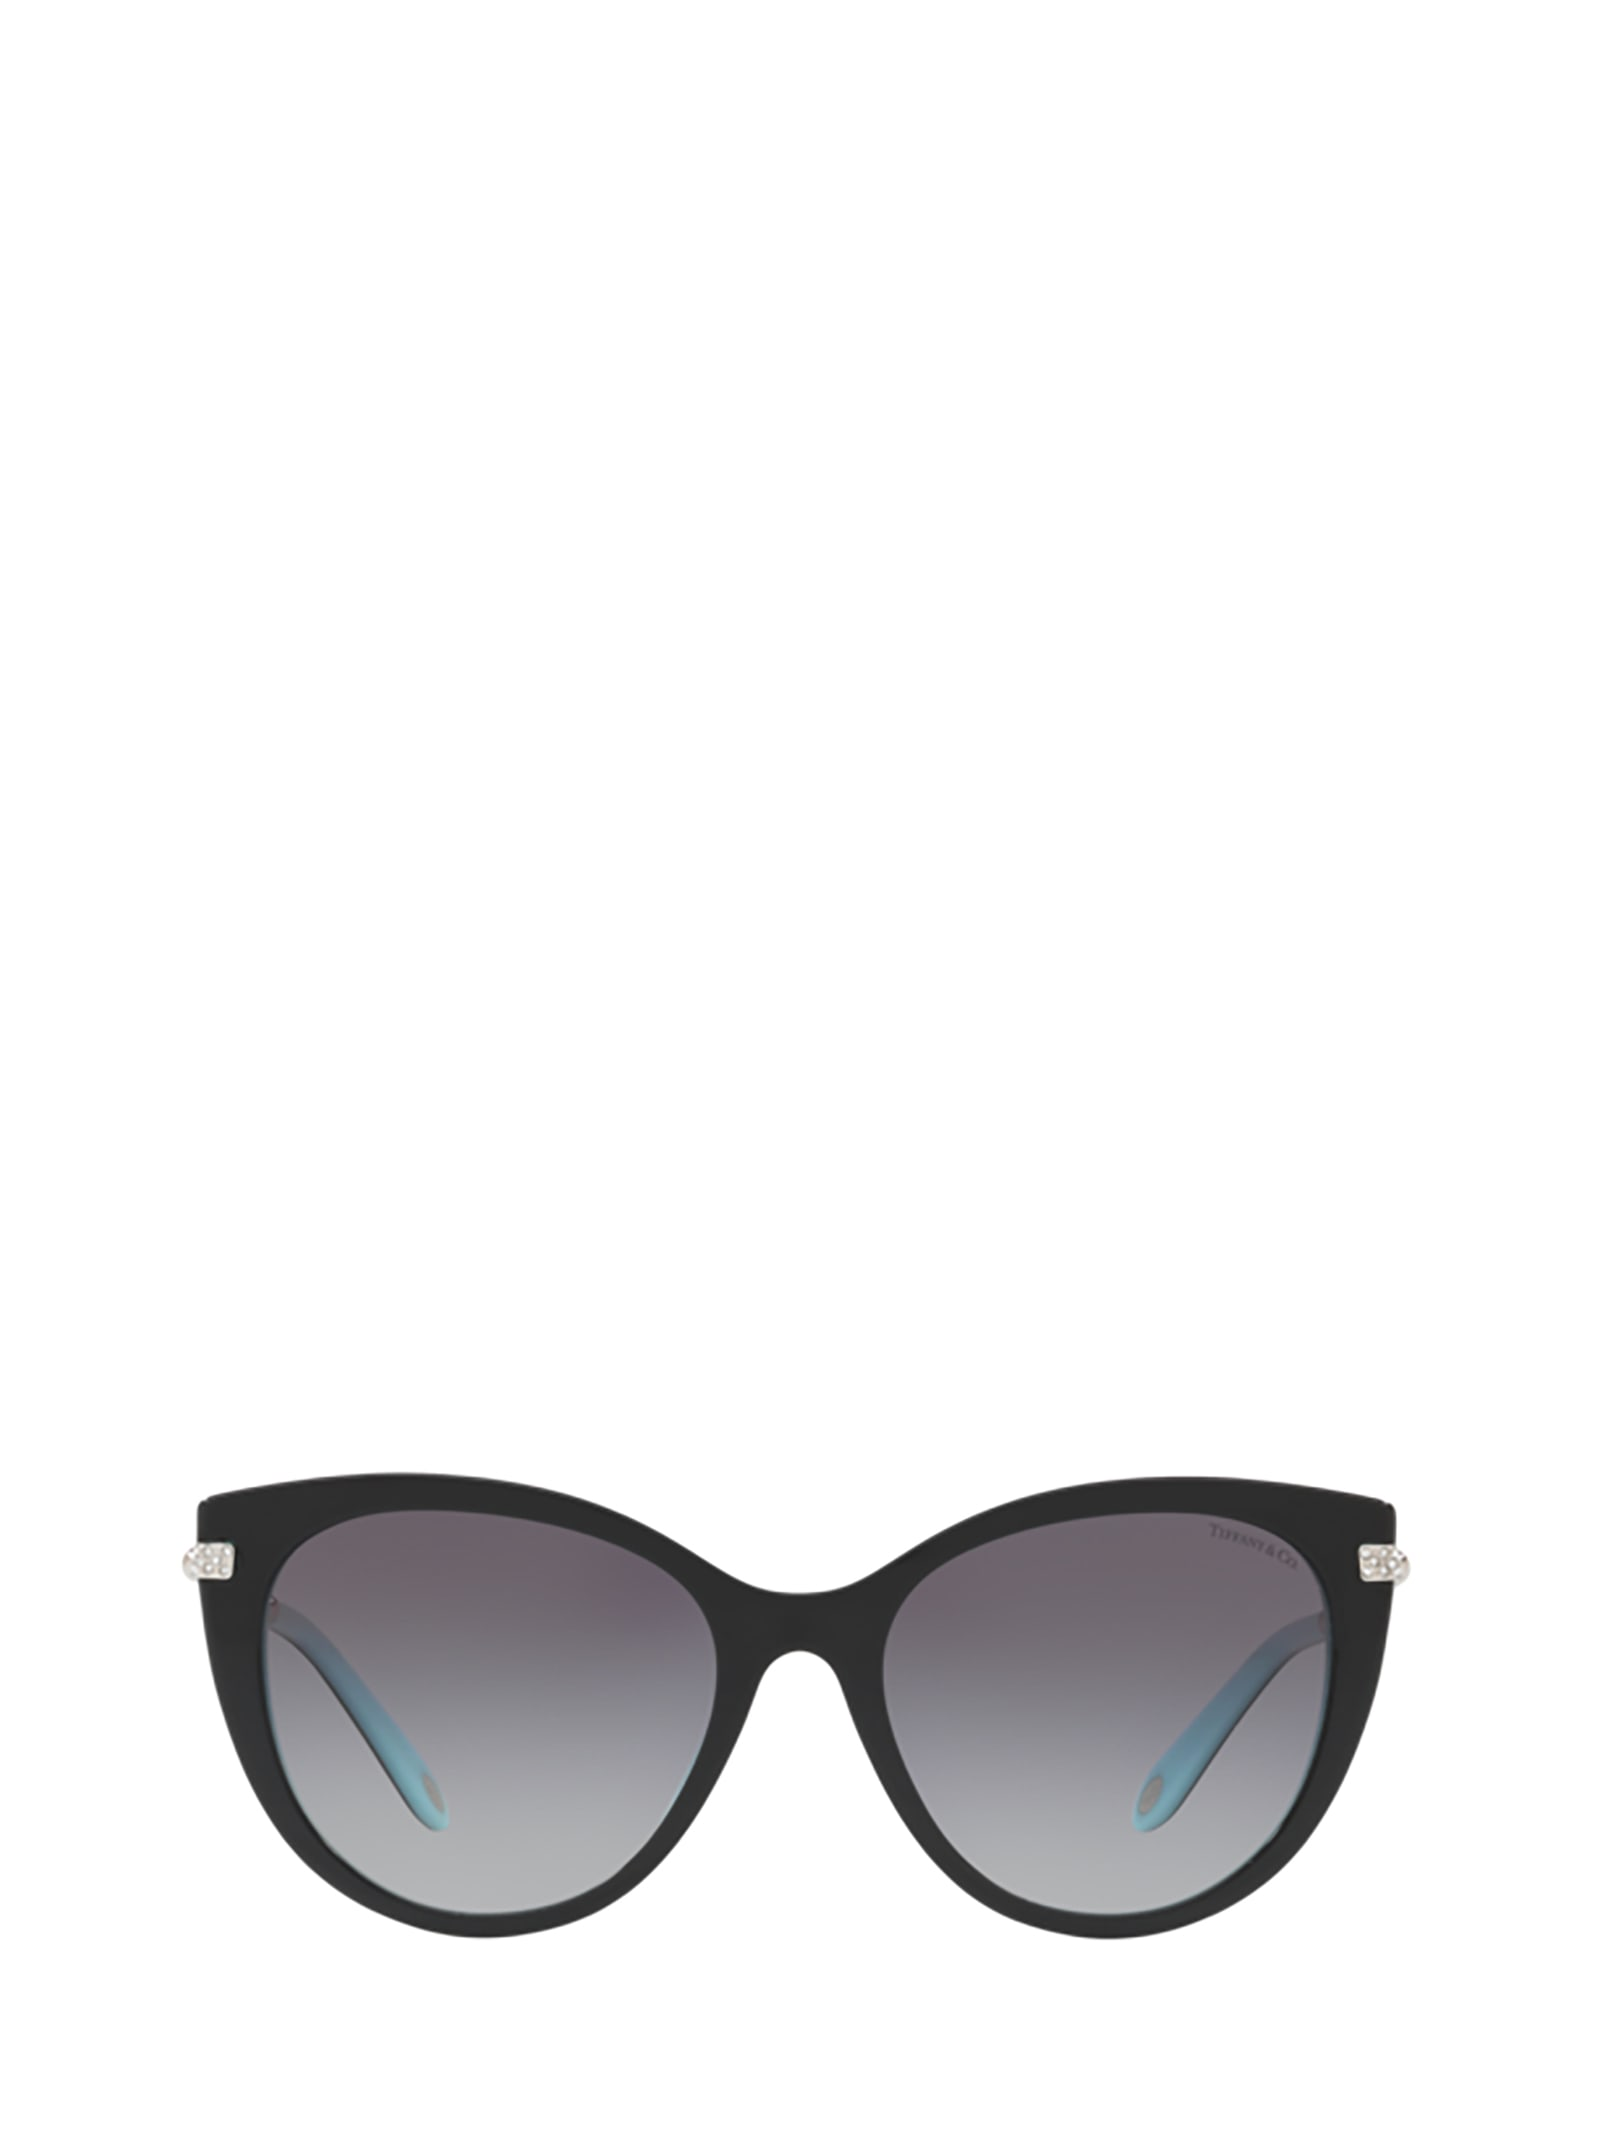 Tiffany & Co. Tiffany Tf4143b Black / Blue Sunglasses